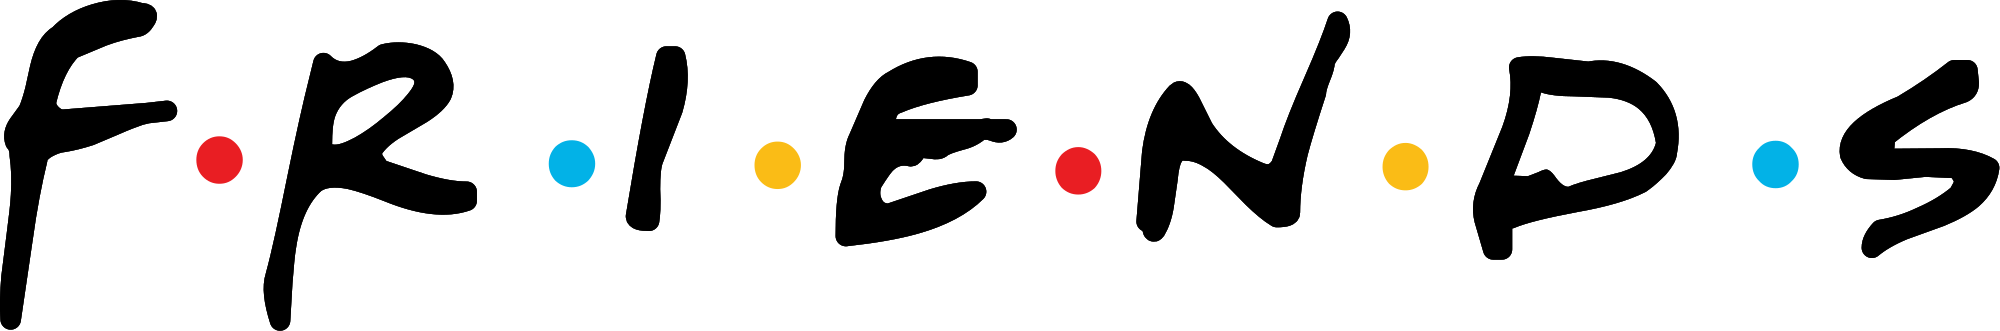 Friends Black Logo.png